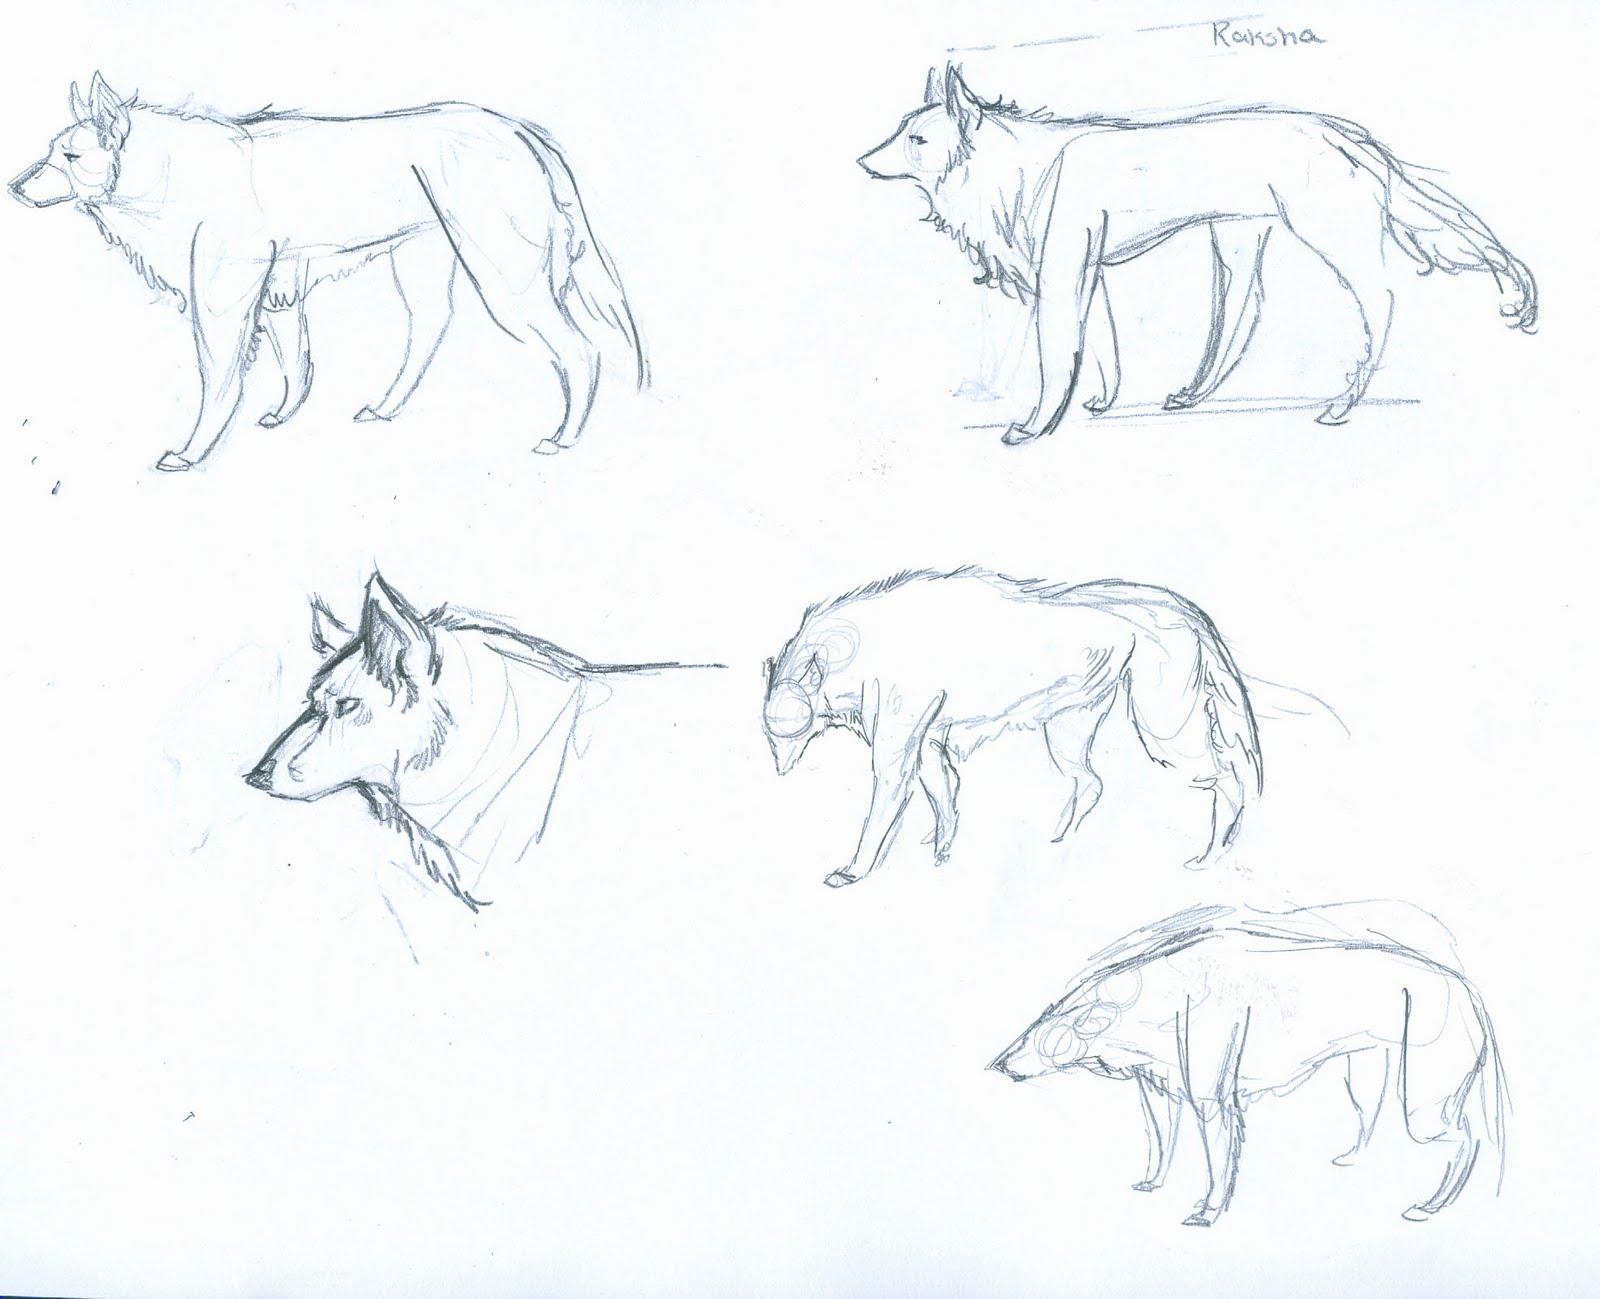 Jungle Book Sketches - DriverLayer Search Engine